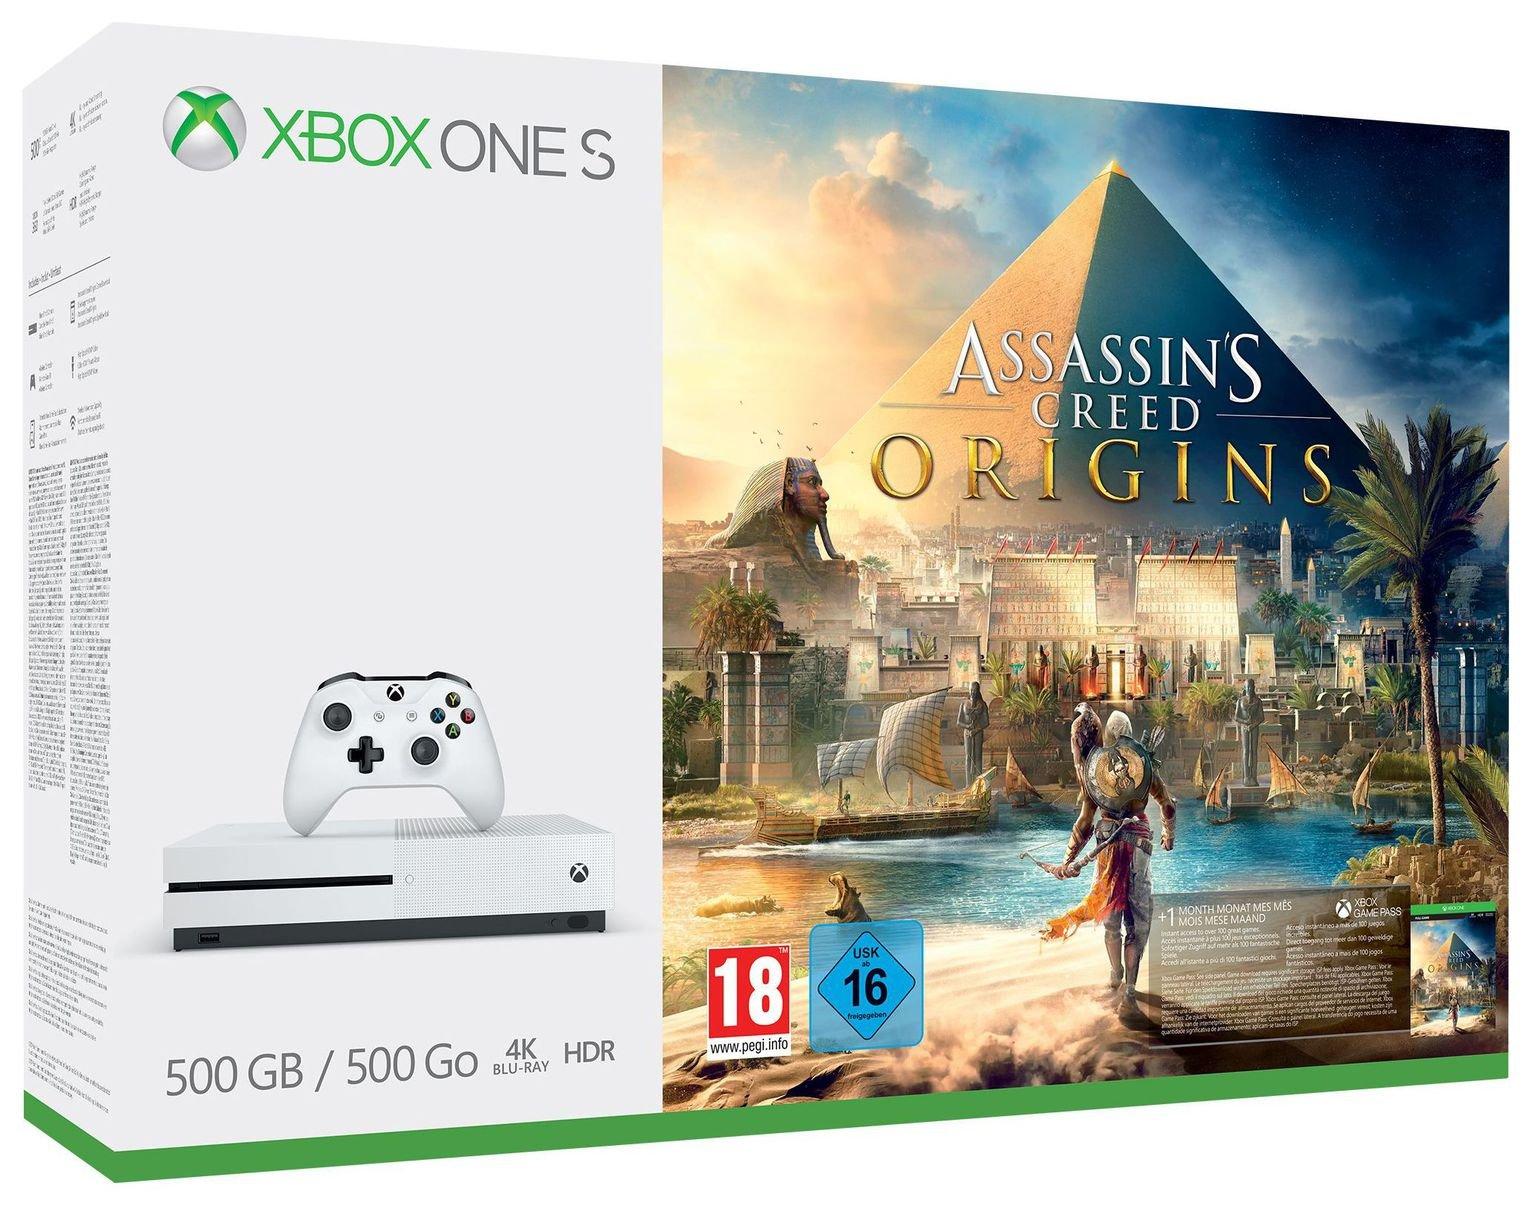 Xbox One S 500GB Assassins Creed Bundle